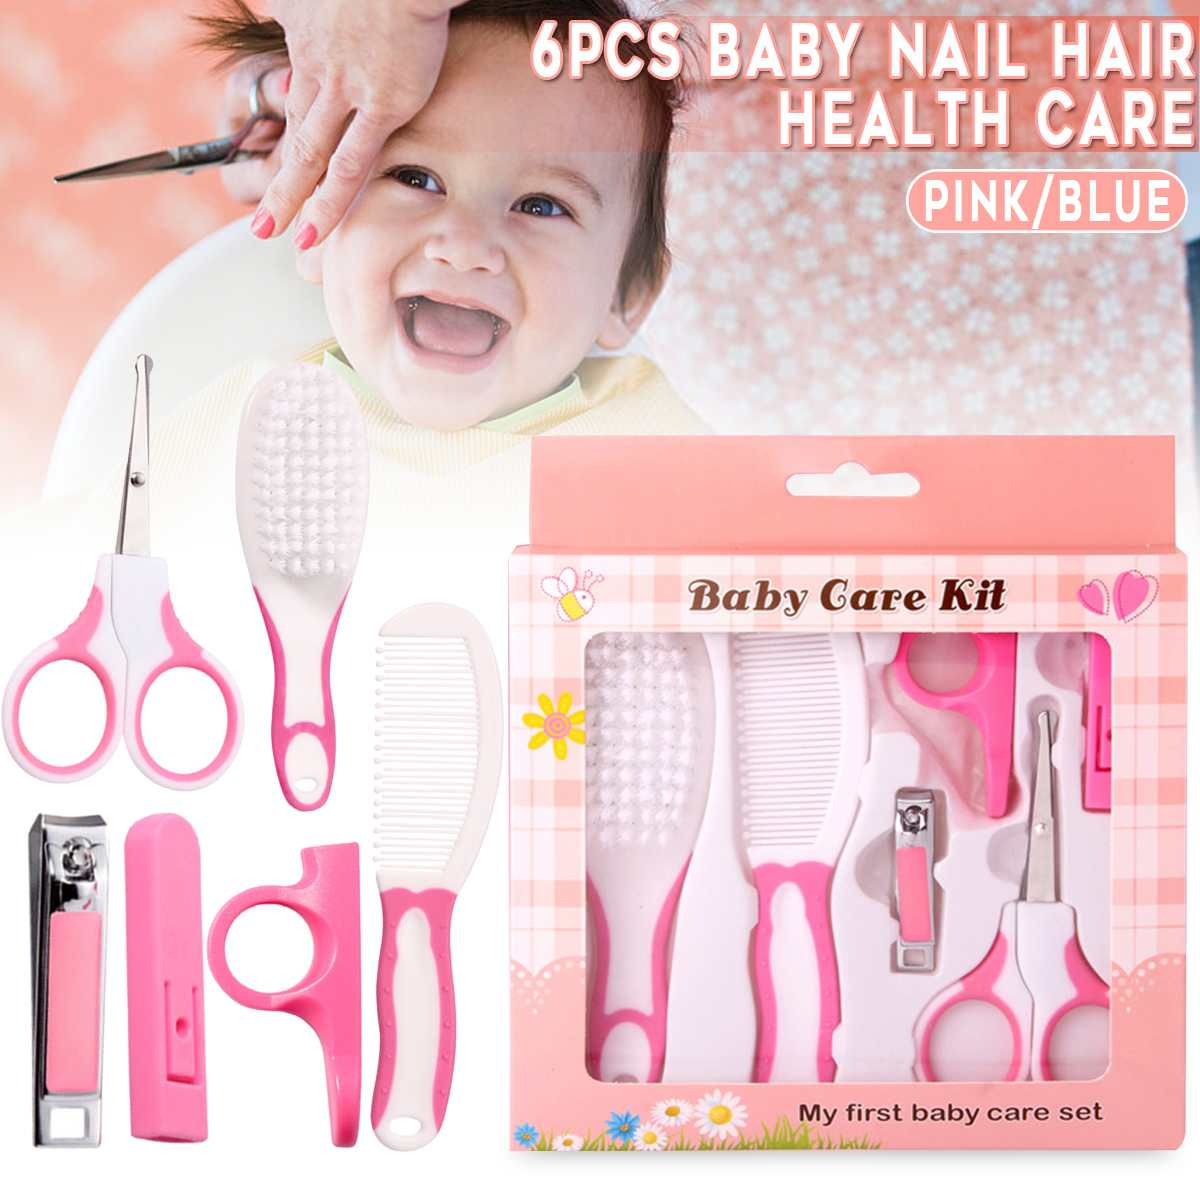 6Pcs/Set Baby Infant Kids Nail Hair Health Care Grooming Brush Comb Scissors Kit Grooming Brush Kit Baby Care